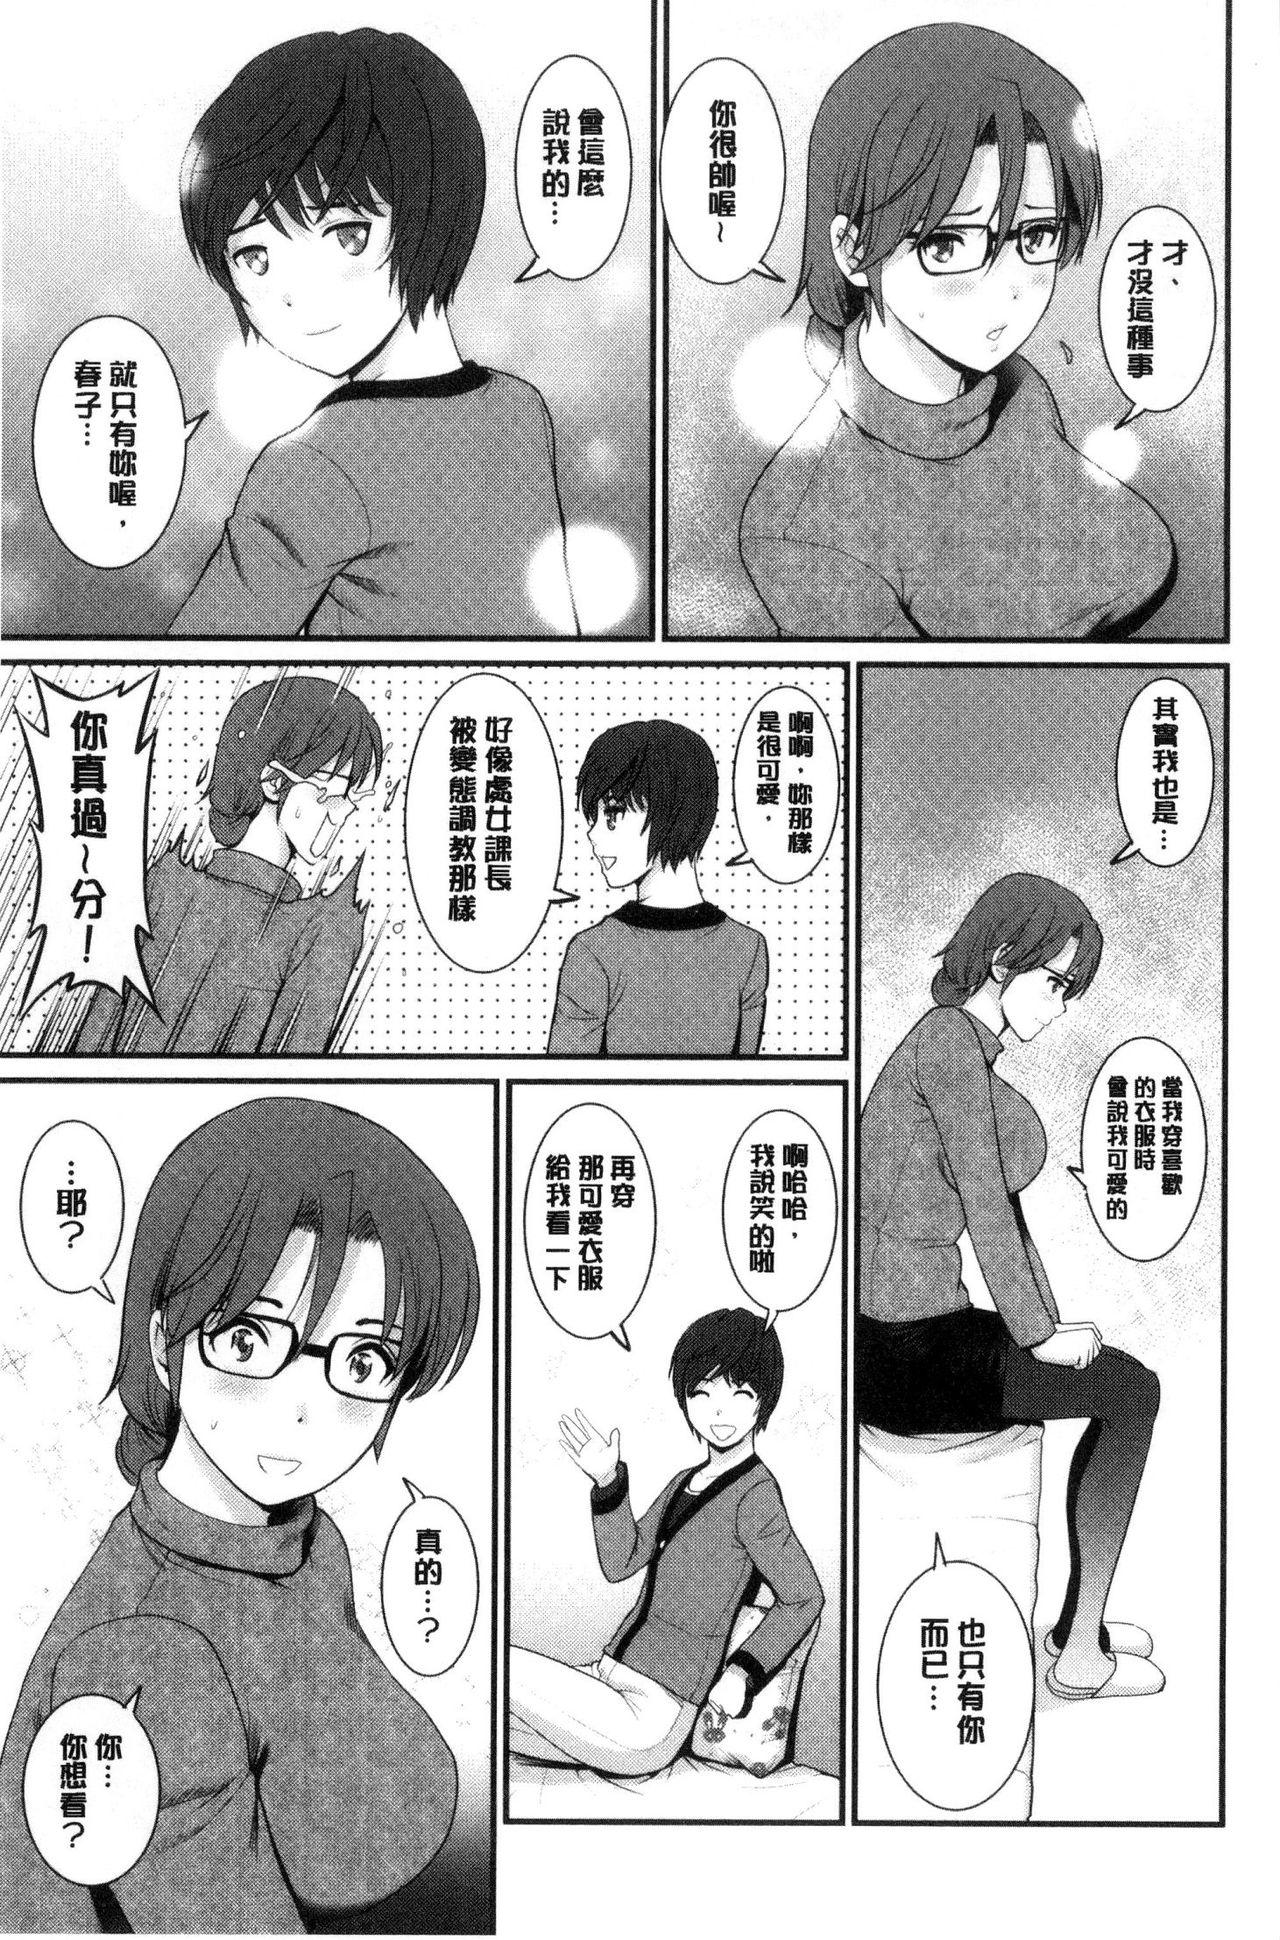 Toshimaku Sodachi no Toshima-san   年增區孕育的豐島小姐 29